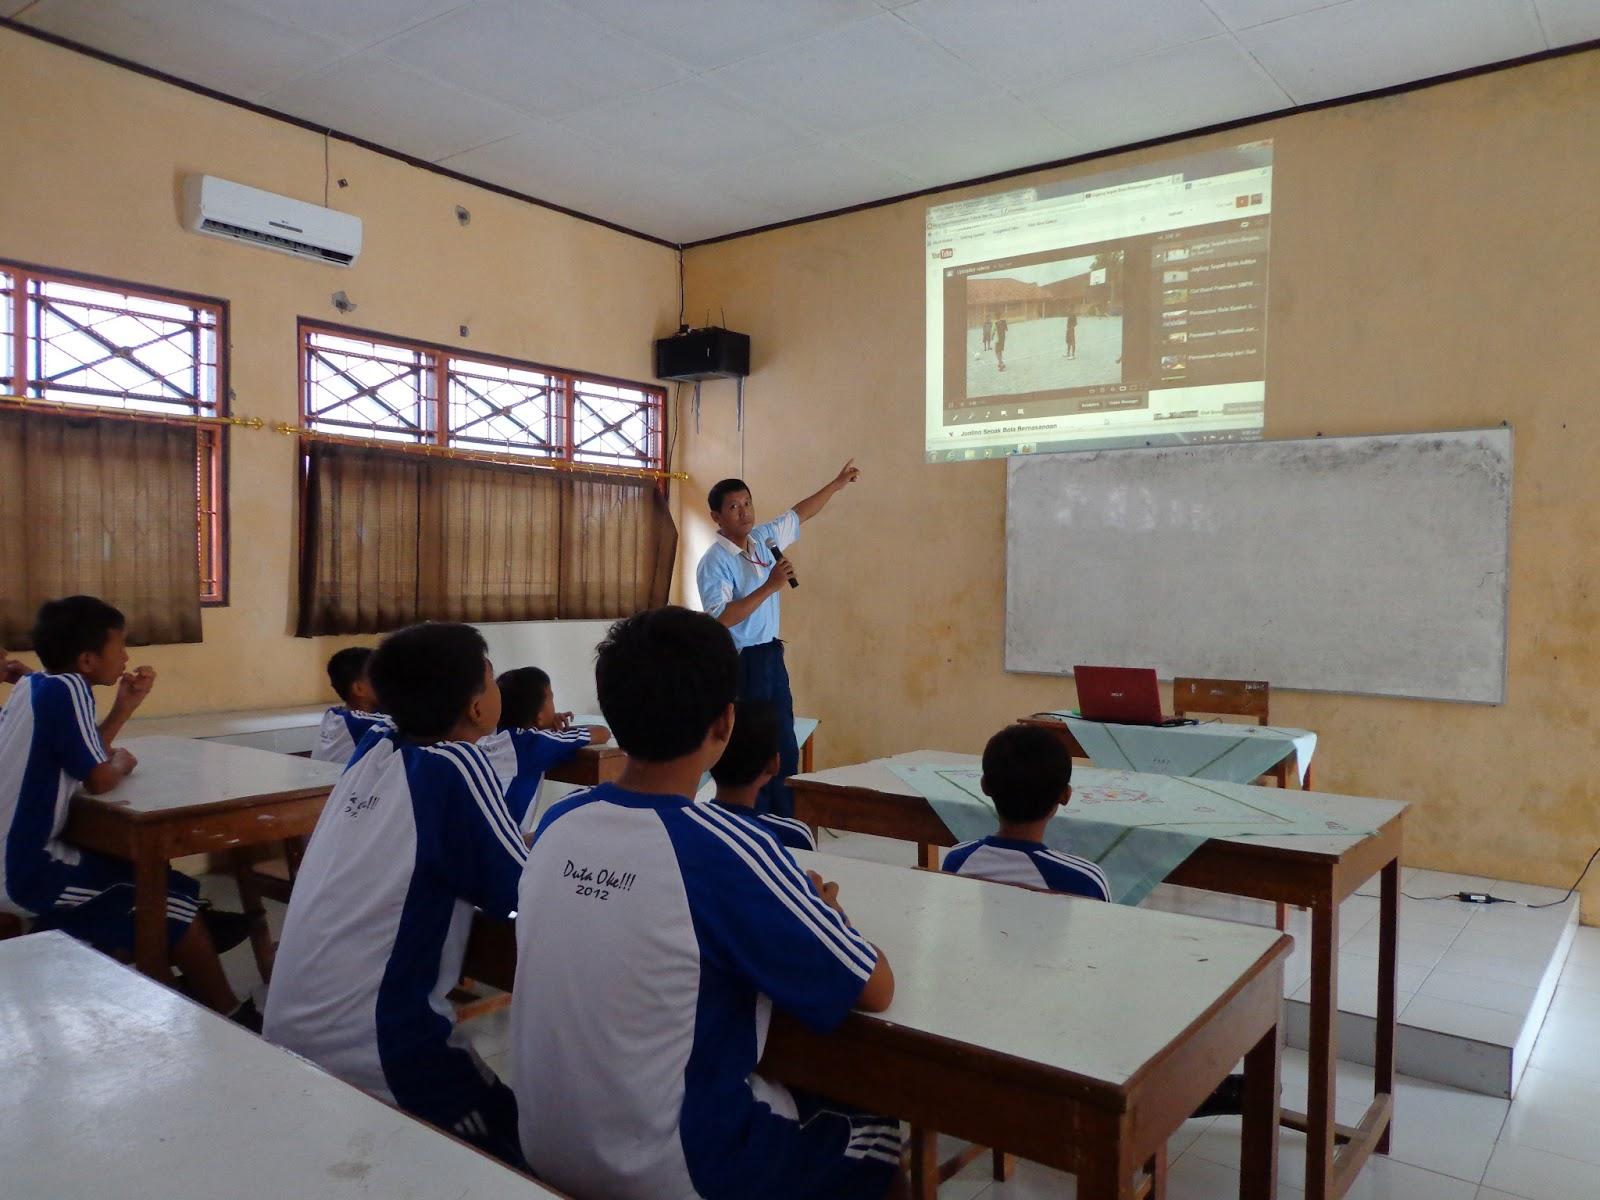 Blog Guru Penjasorkes Pengertian Dan Tujuan Pendidikan Jasmani